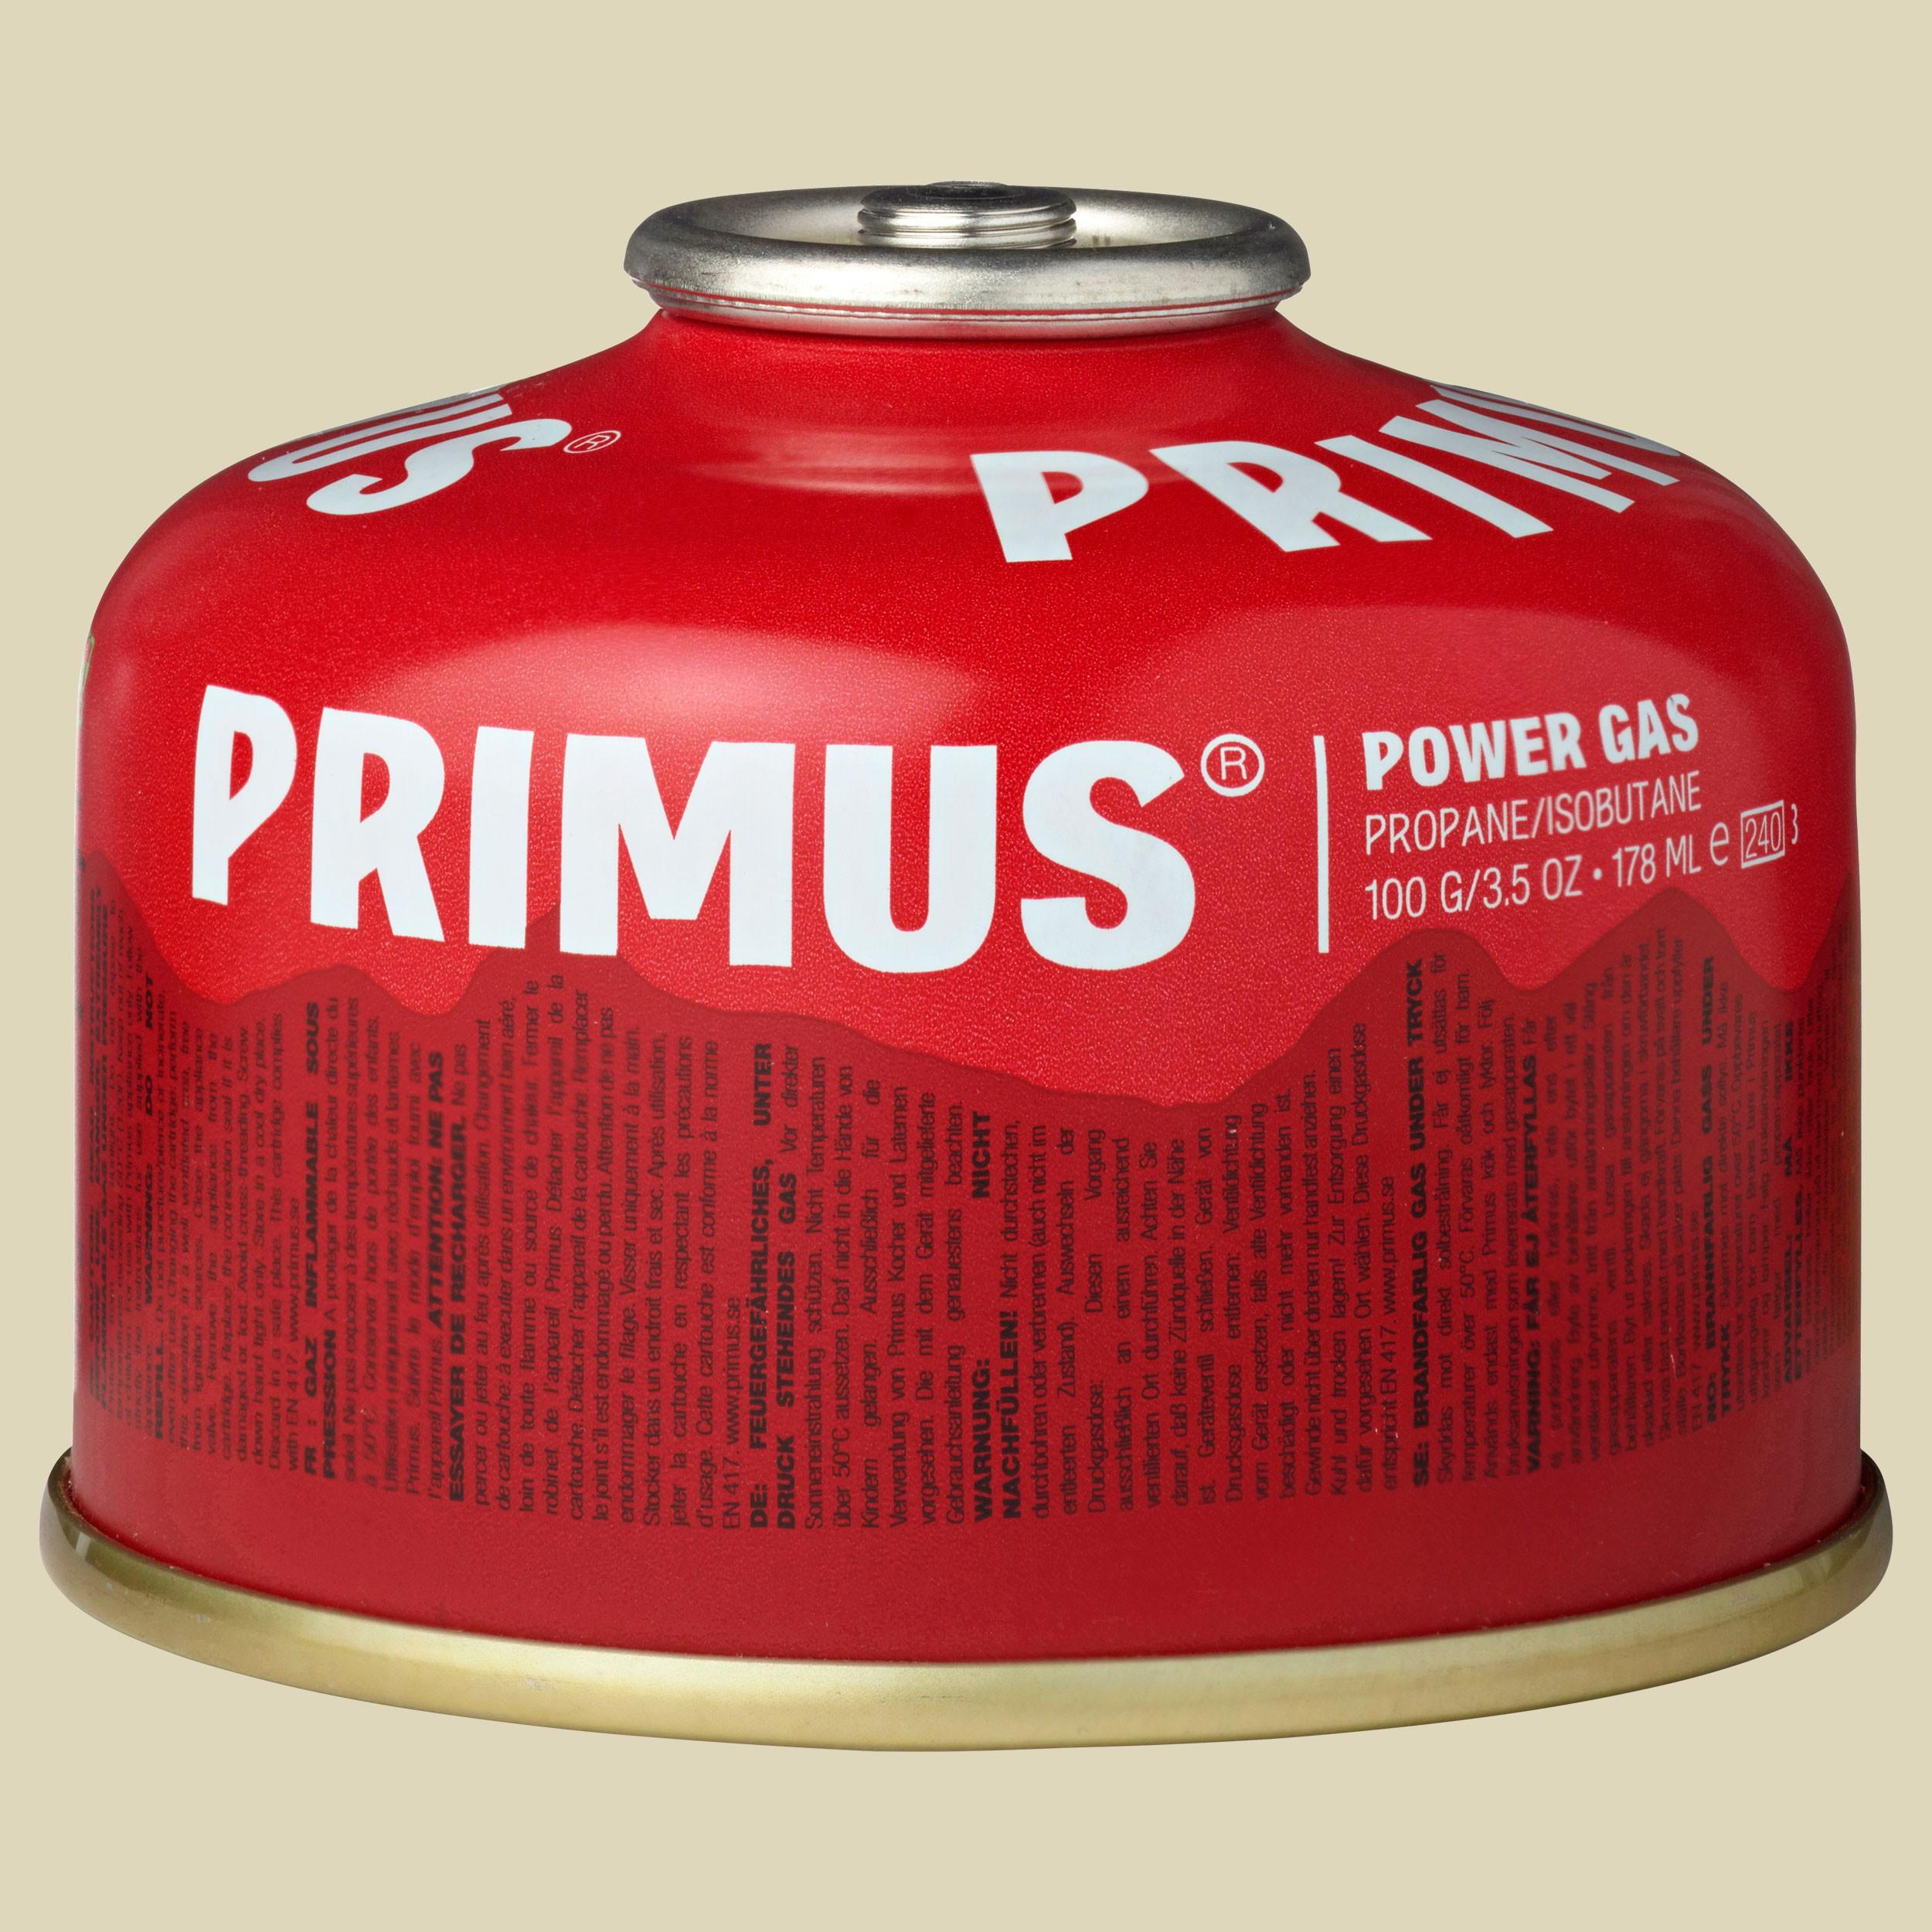 primus_220661_Power_Gas_100_II_fallback